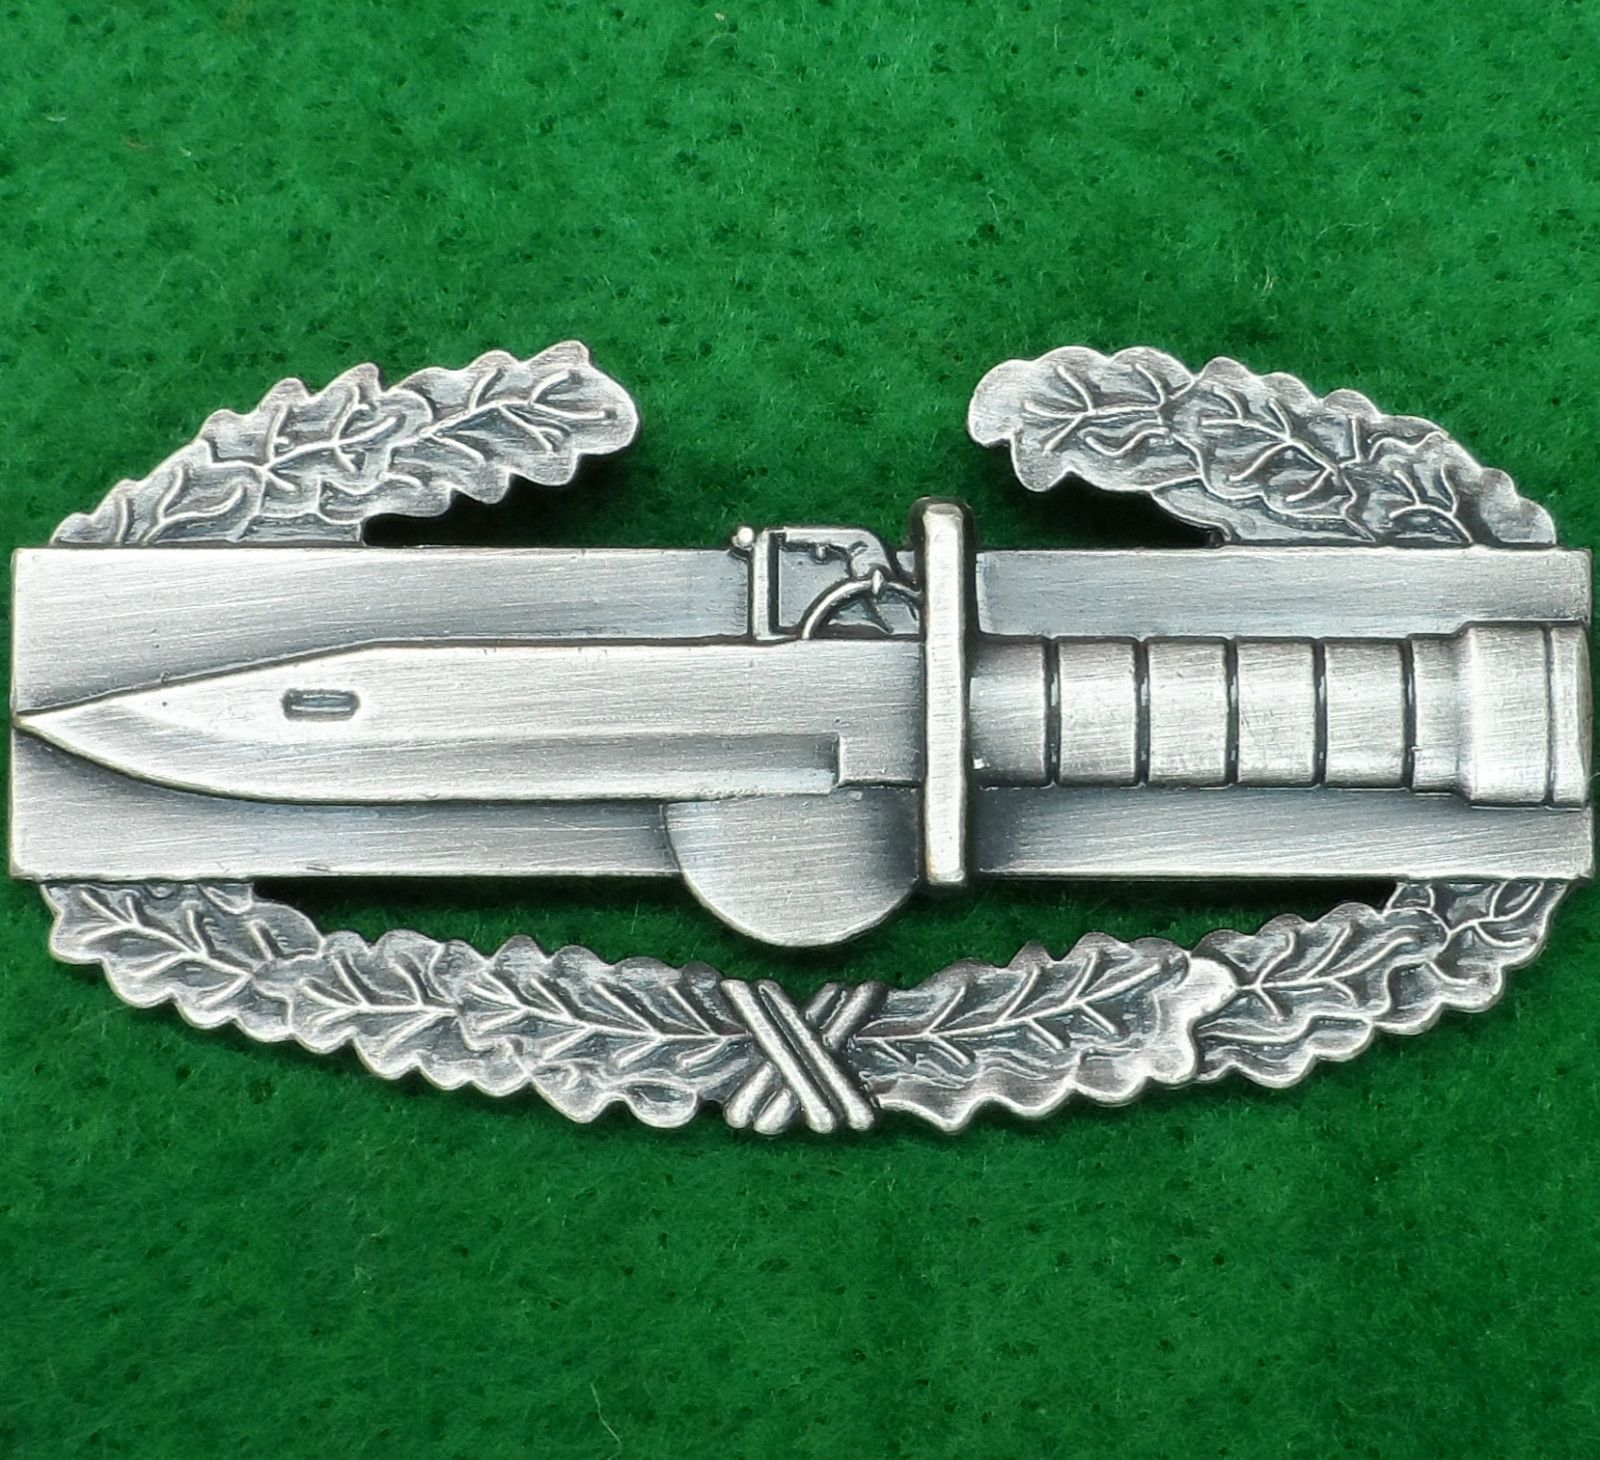 US ARMY COMBAT ACTION BADGE AWARD MEDAL